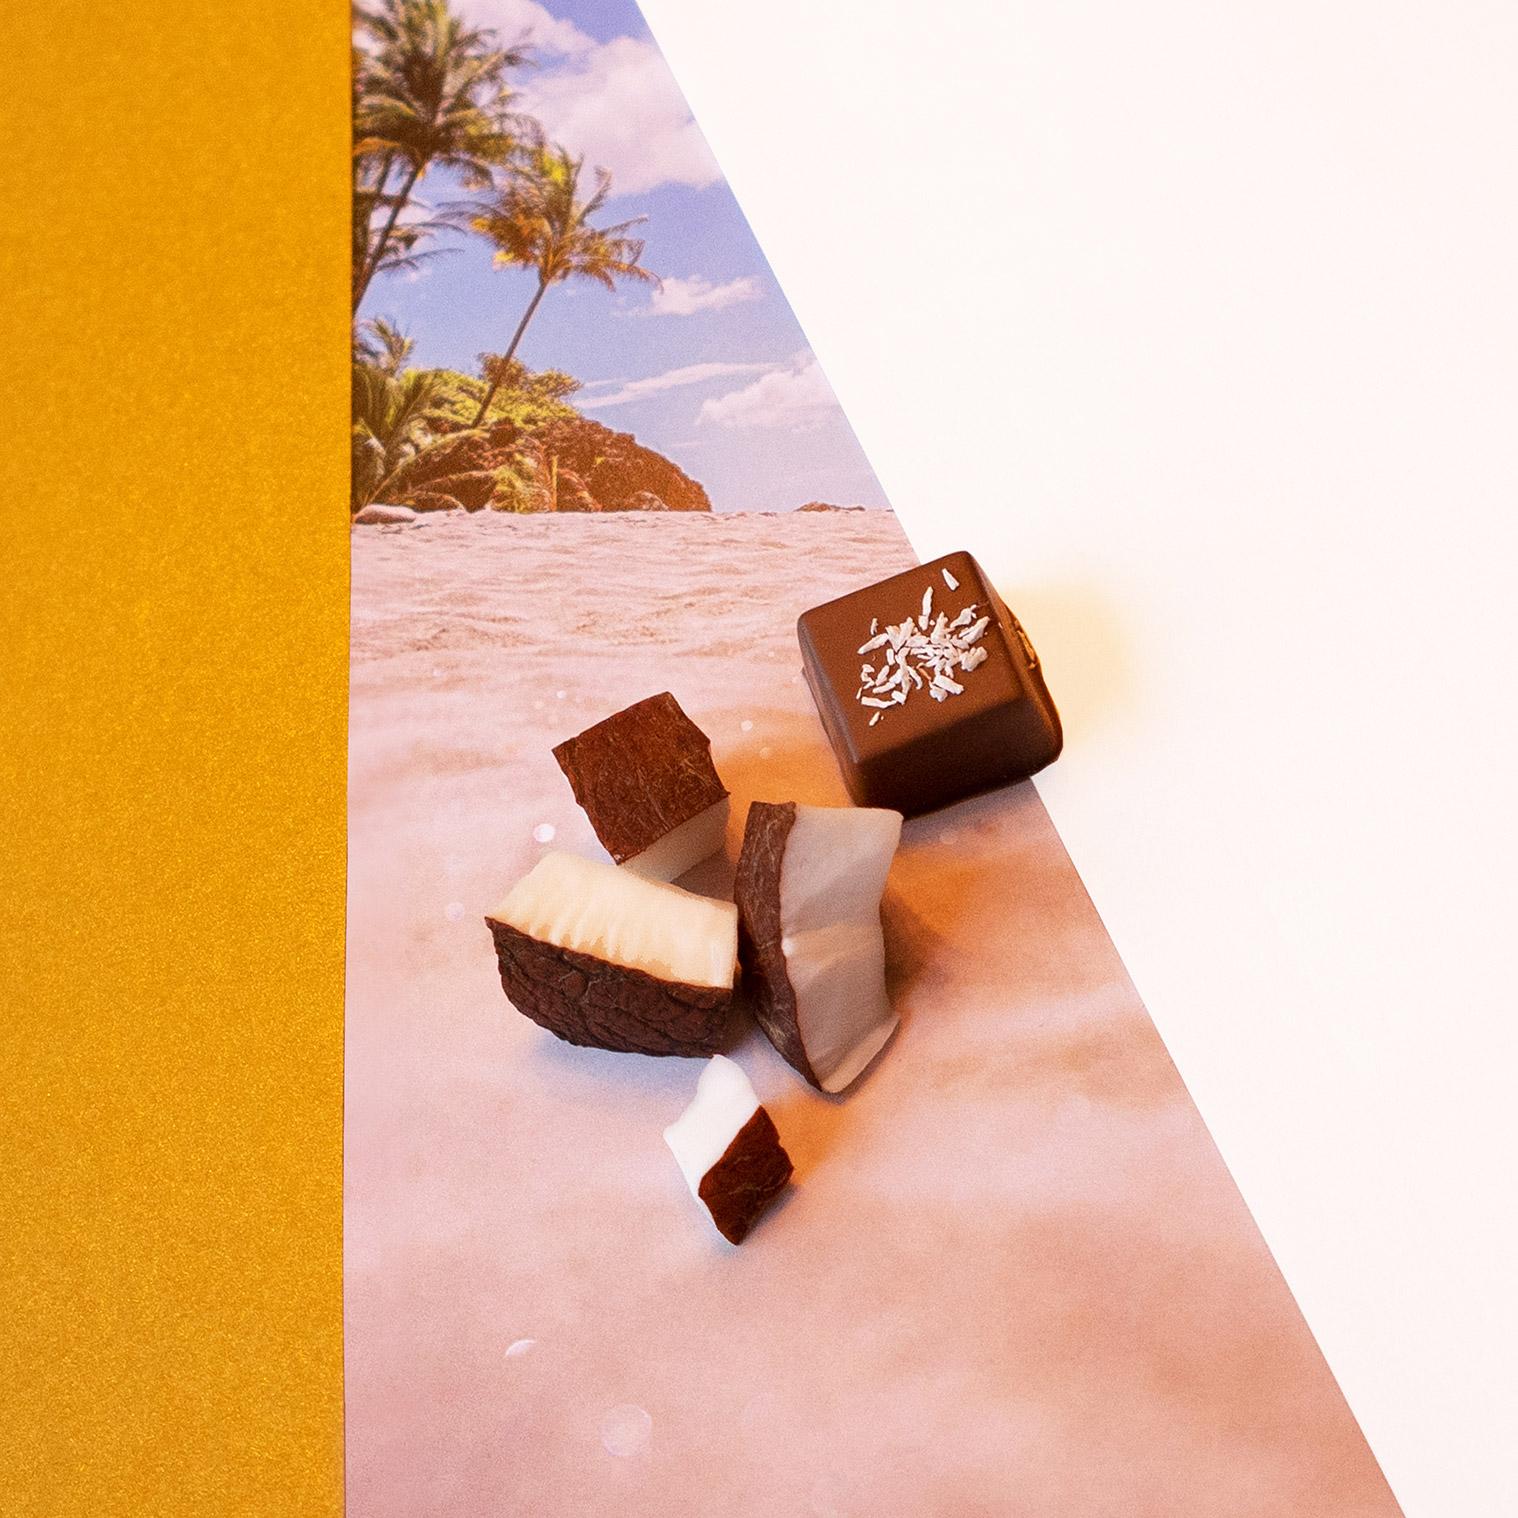 10-ChocolateSquare-15d